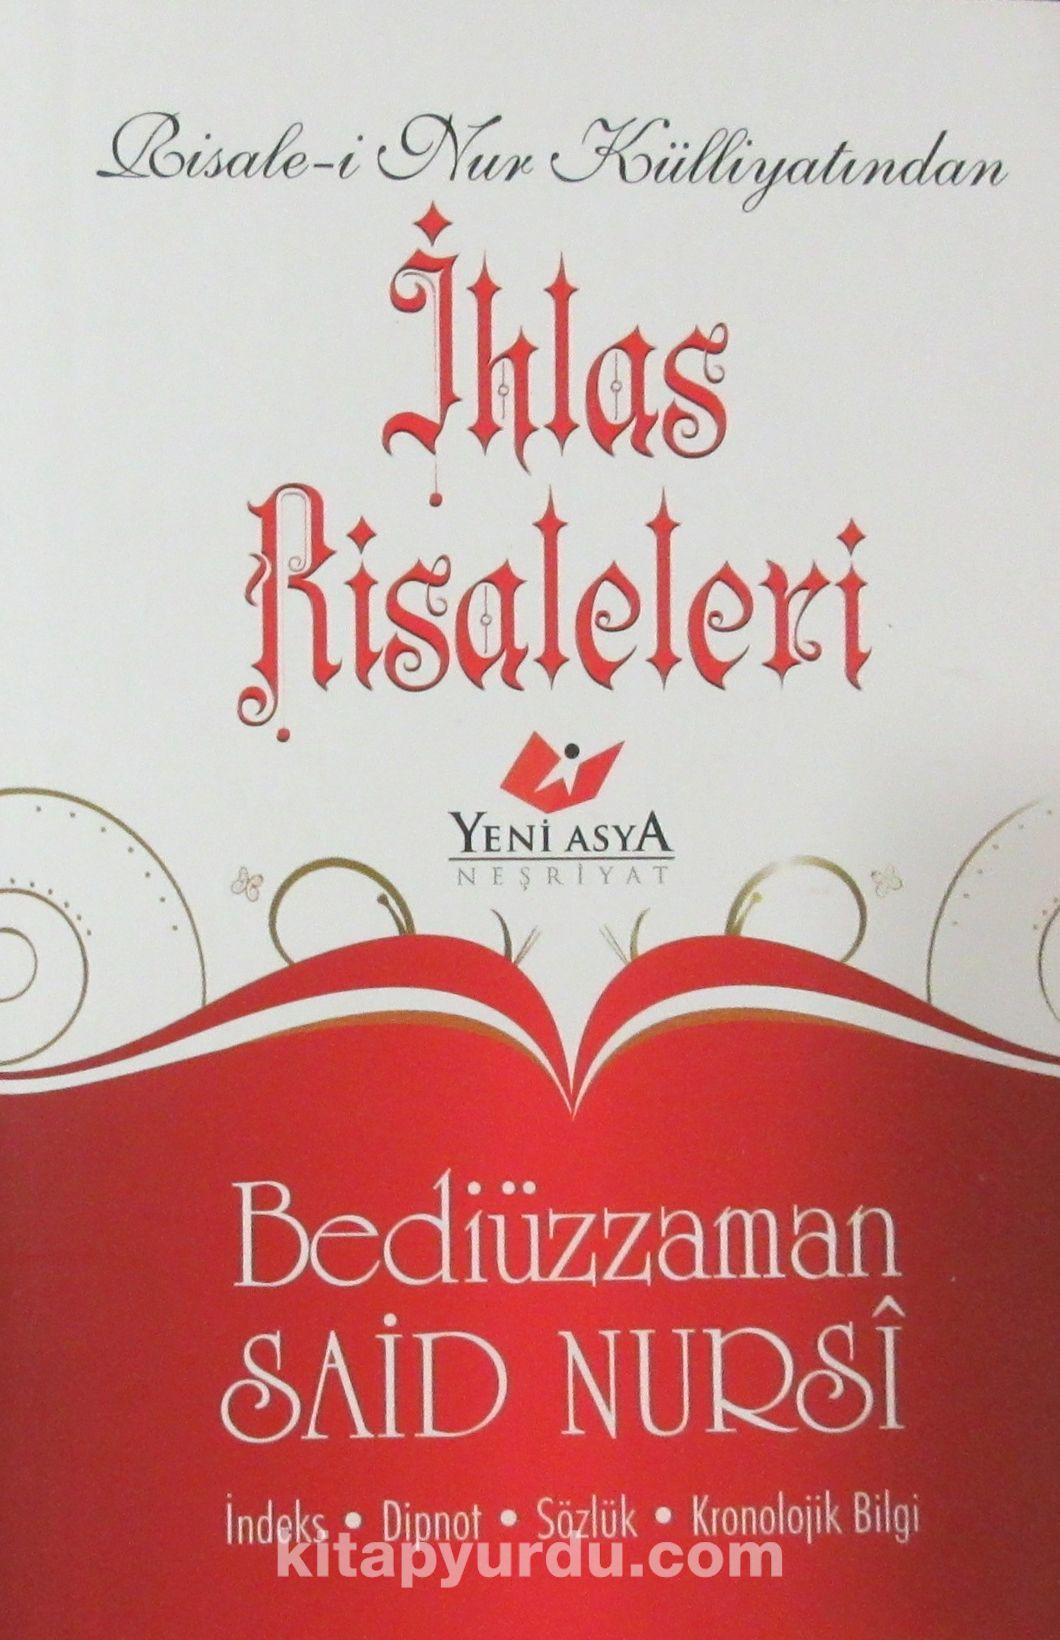 Risale-i Nur Külliyatından İhlas Risaleleri - Bediüzzaman Said Nursi pdf epub